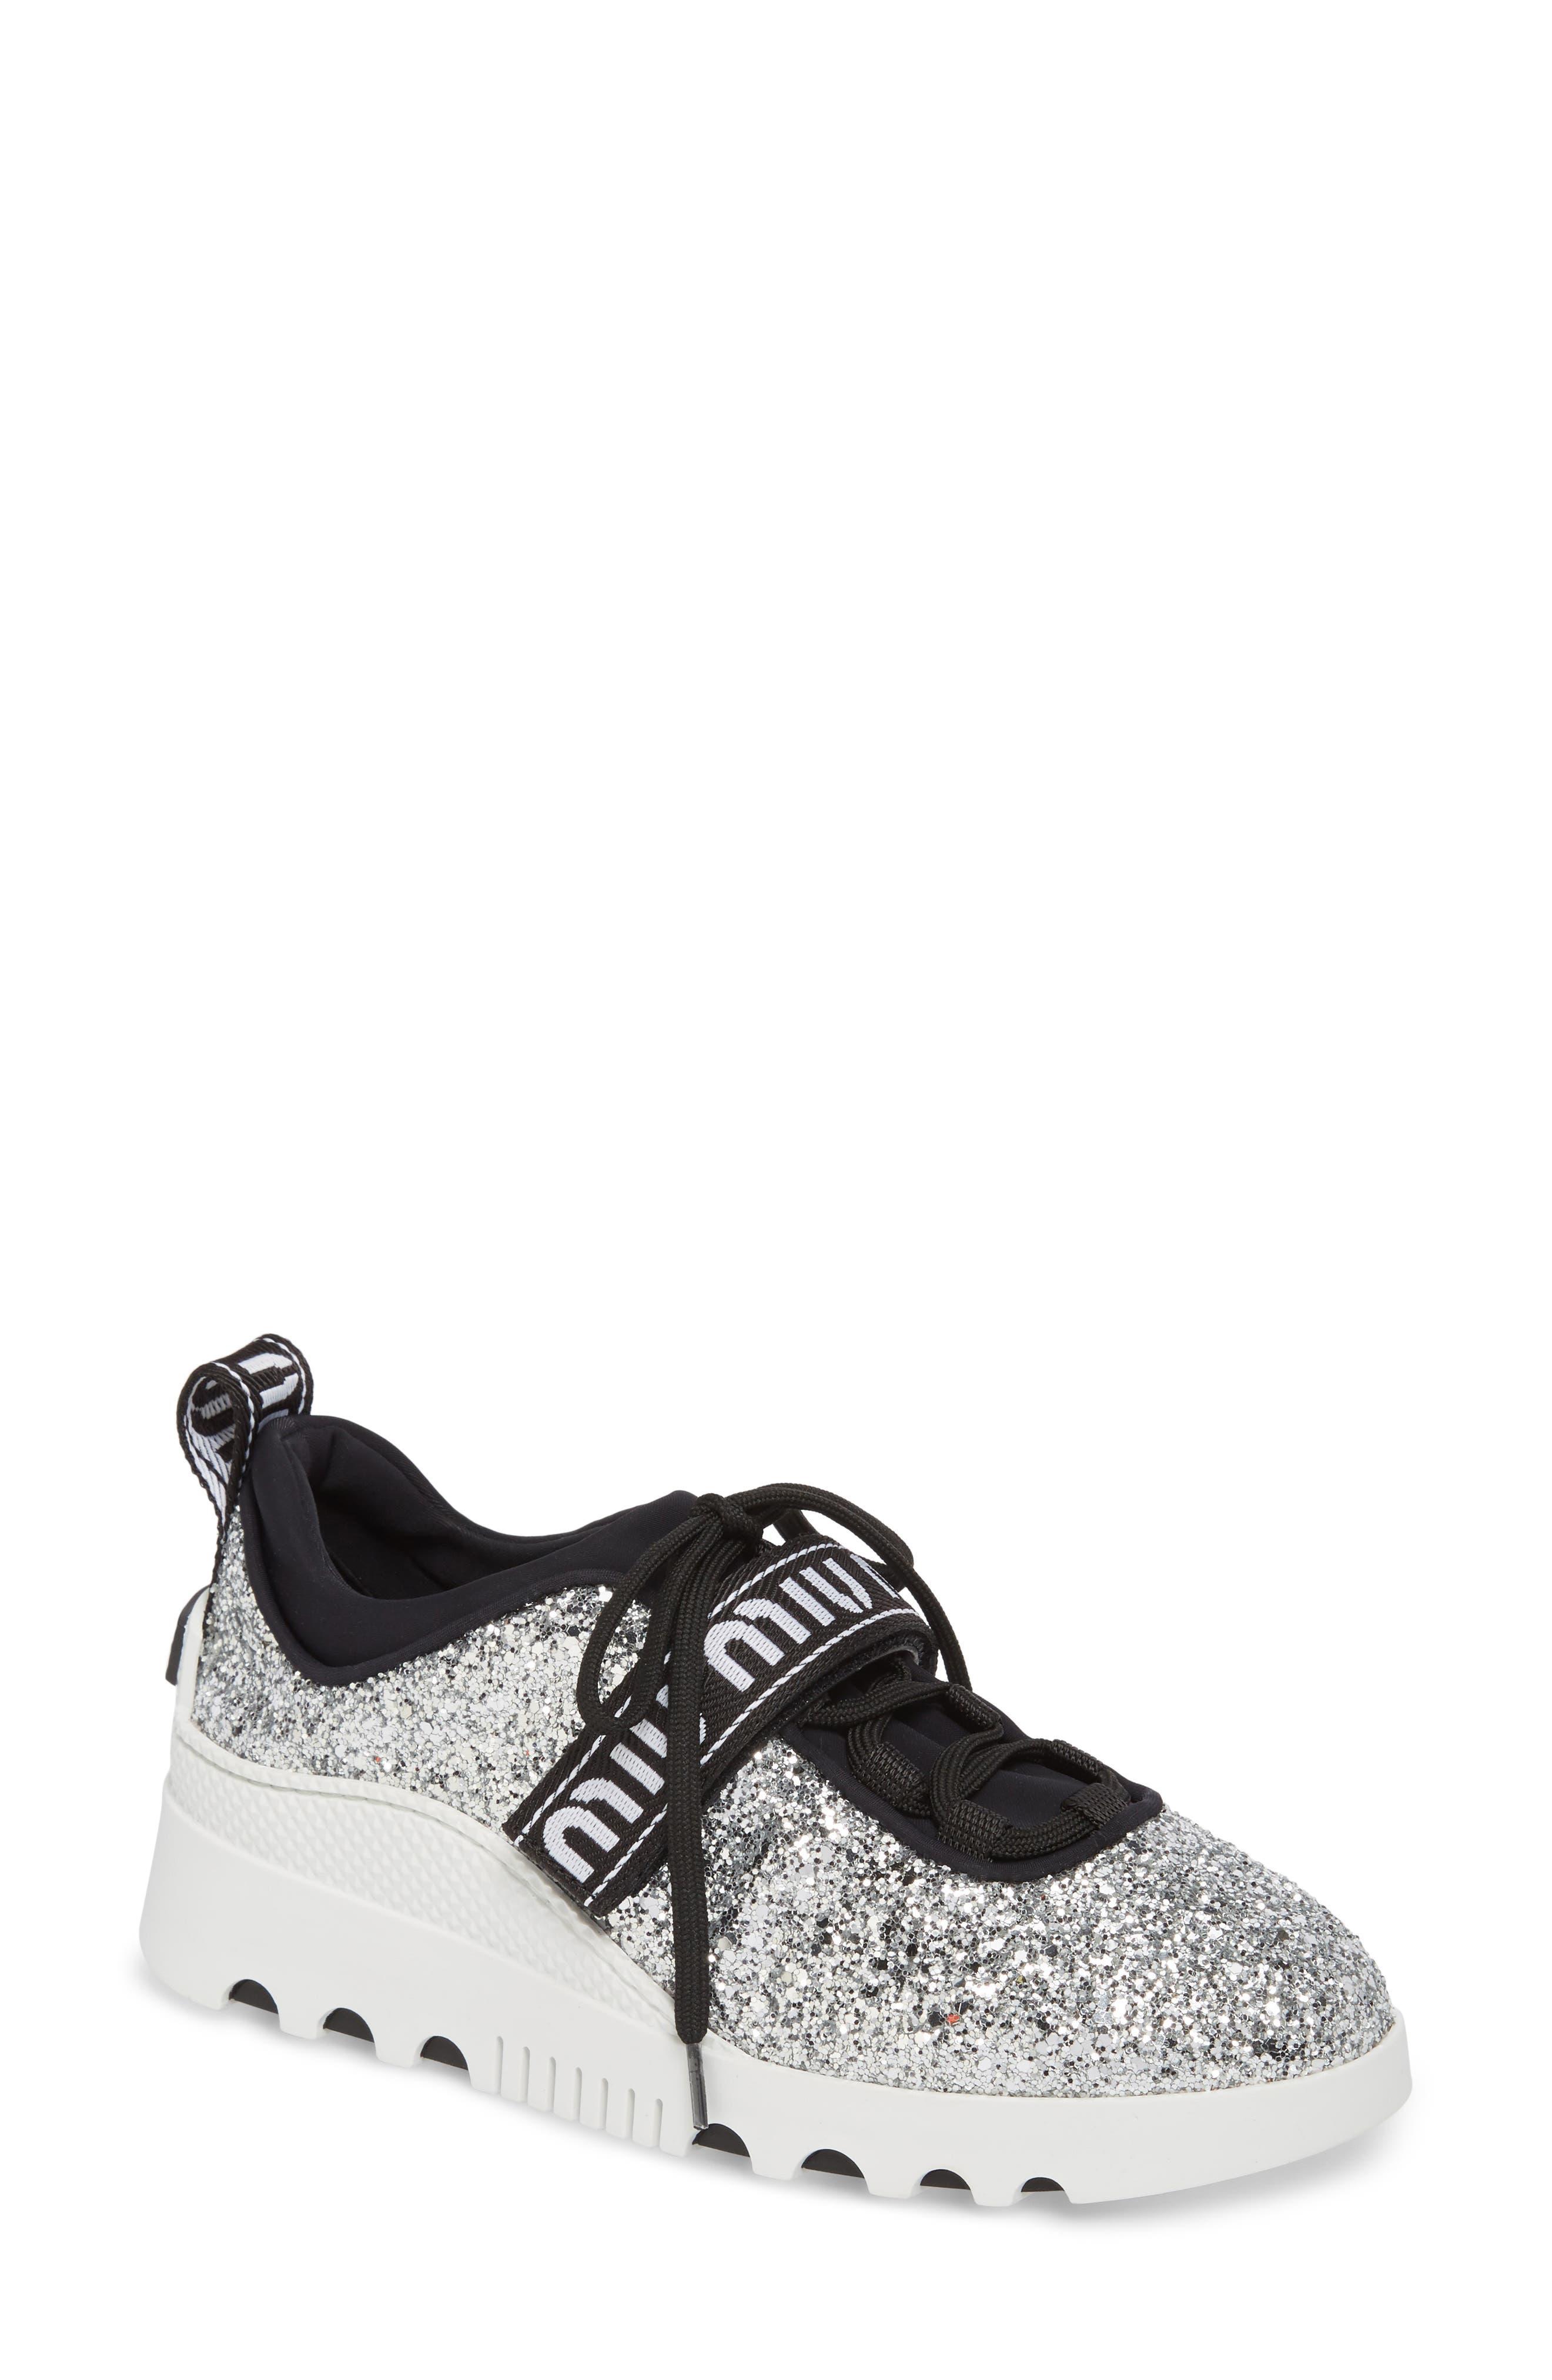 Miu Miu Glitter Sneakers n5VZXy